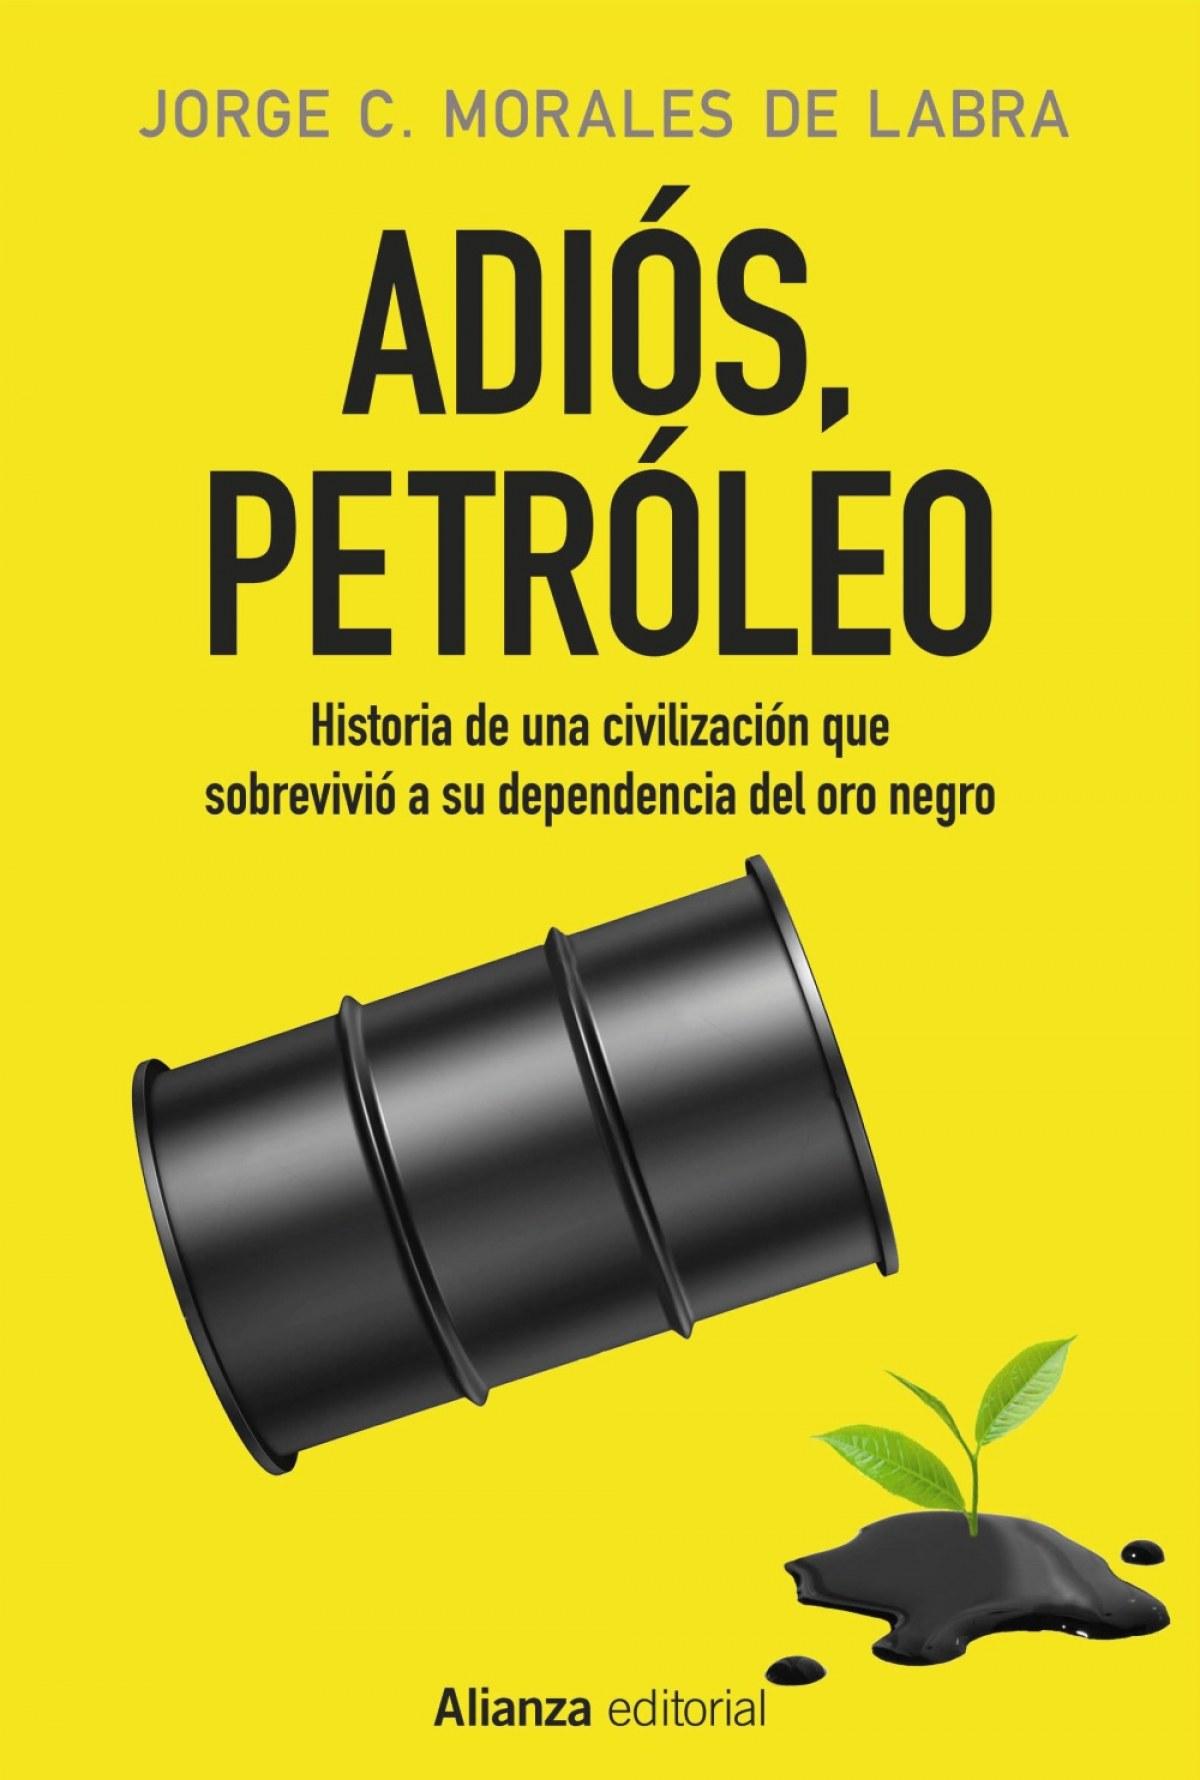 Adiós, petróleo - Morales de Labra, Jorge C.